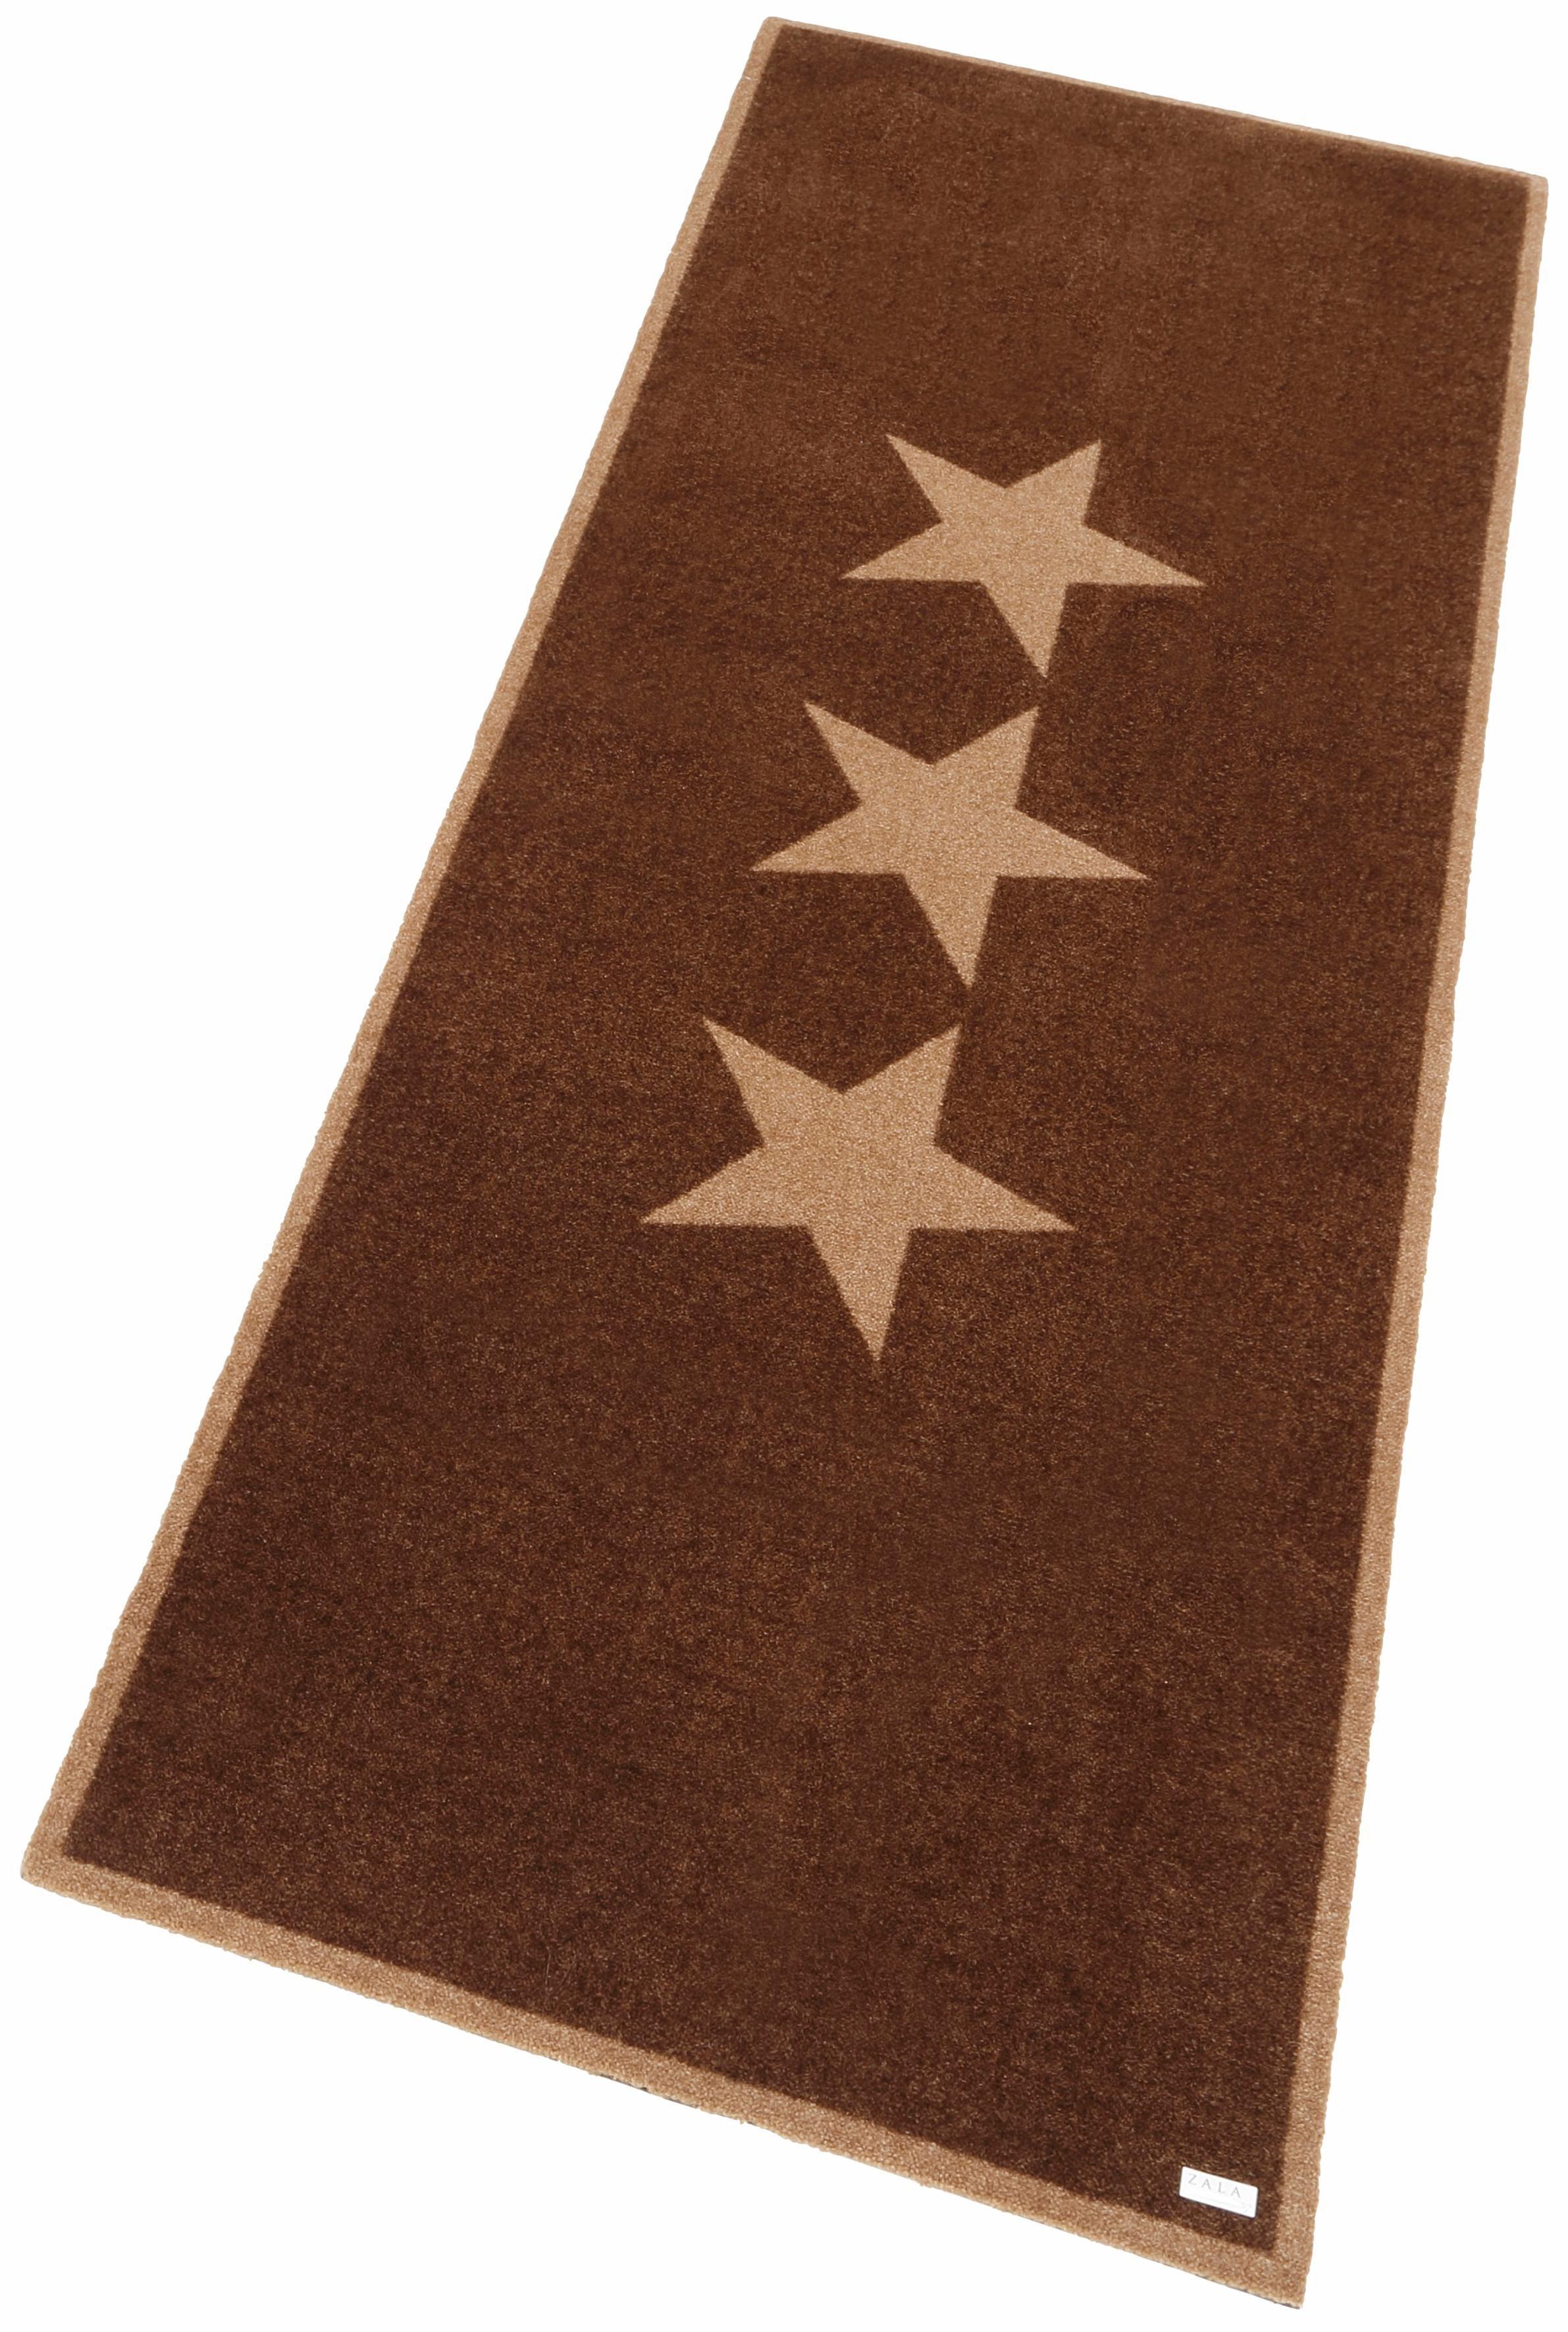 Läufer Sterne Zala Living rechteckig Höhe 7 mm maschinell getuftet